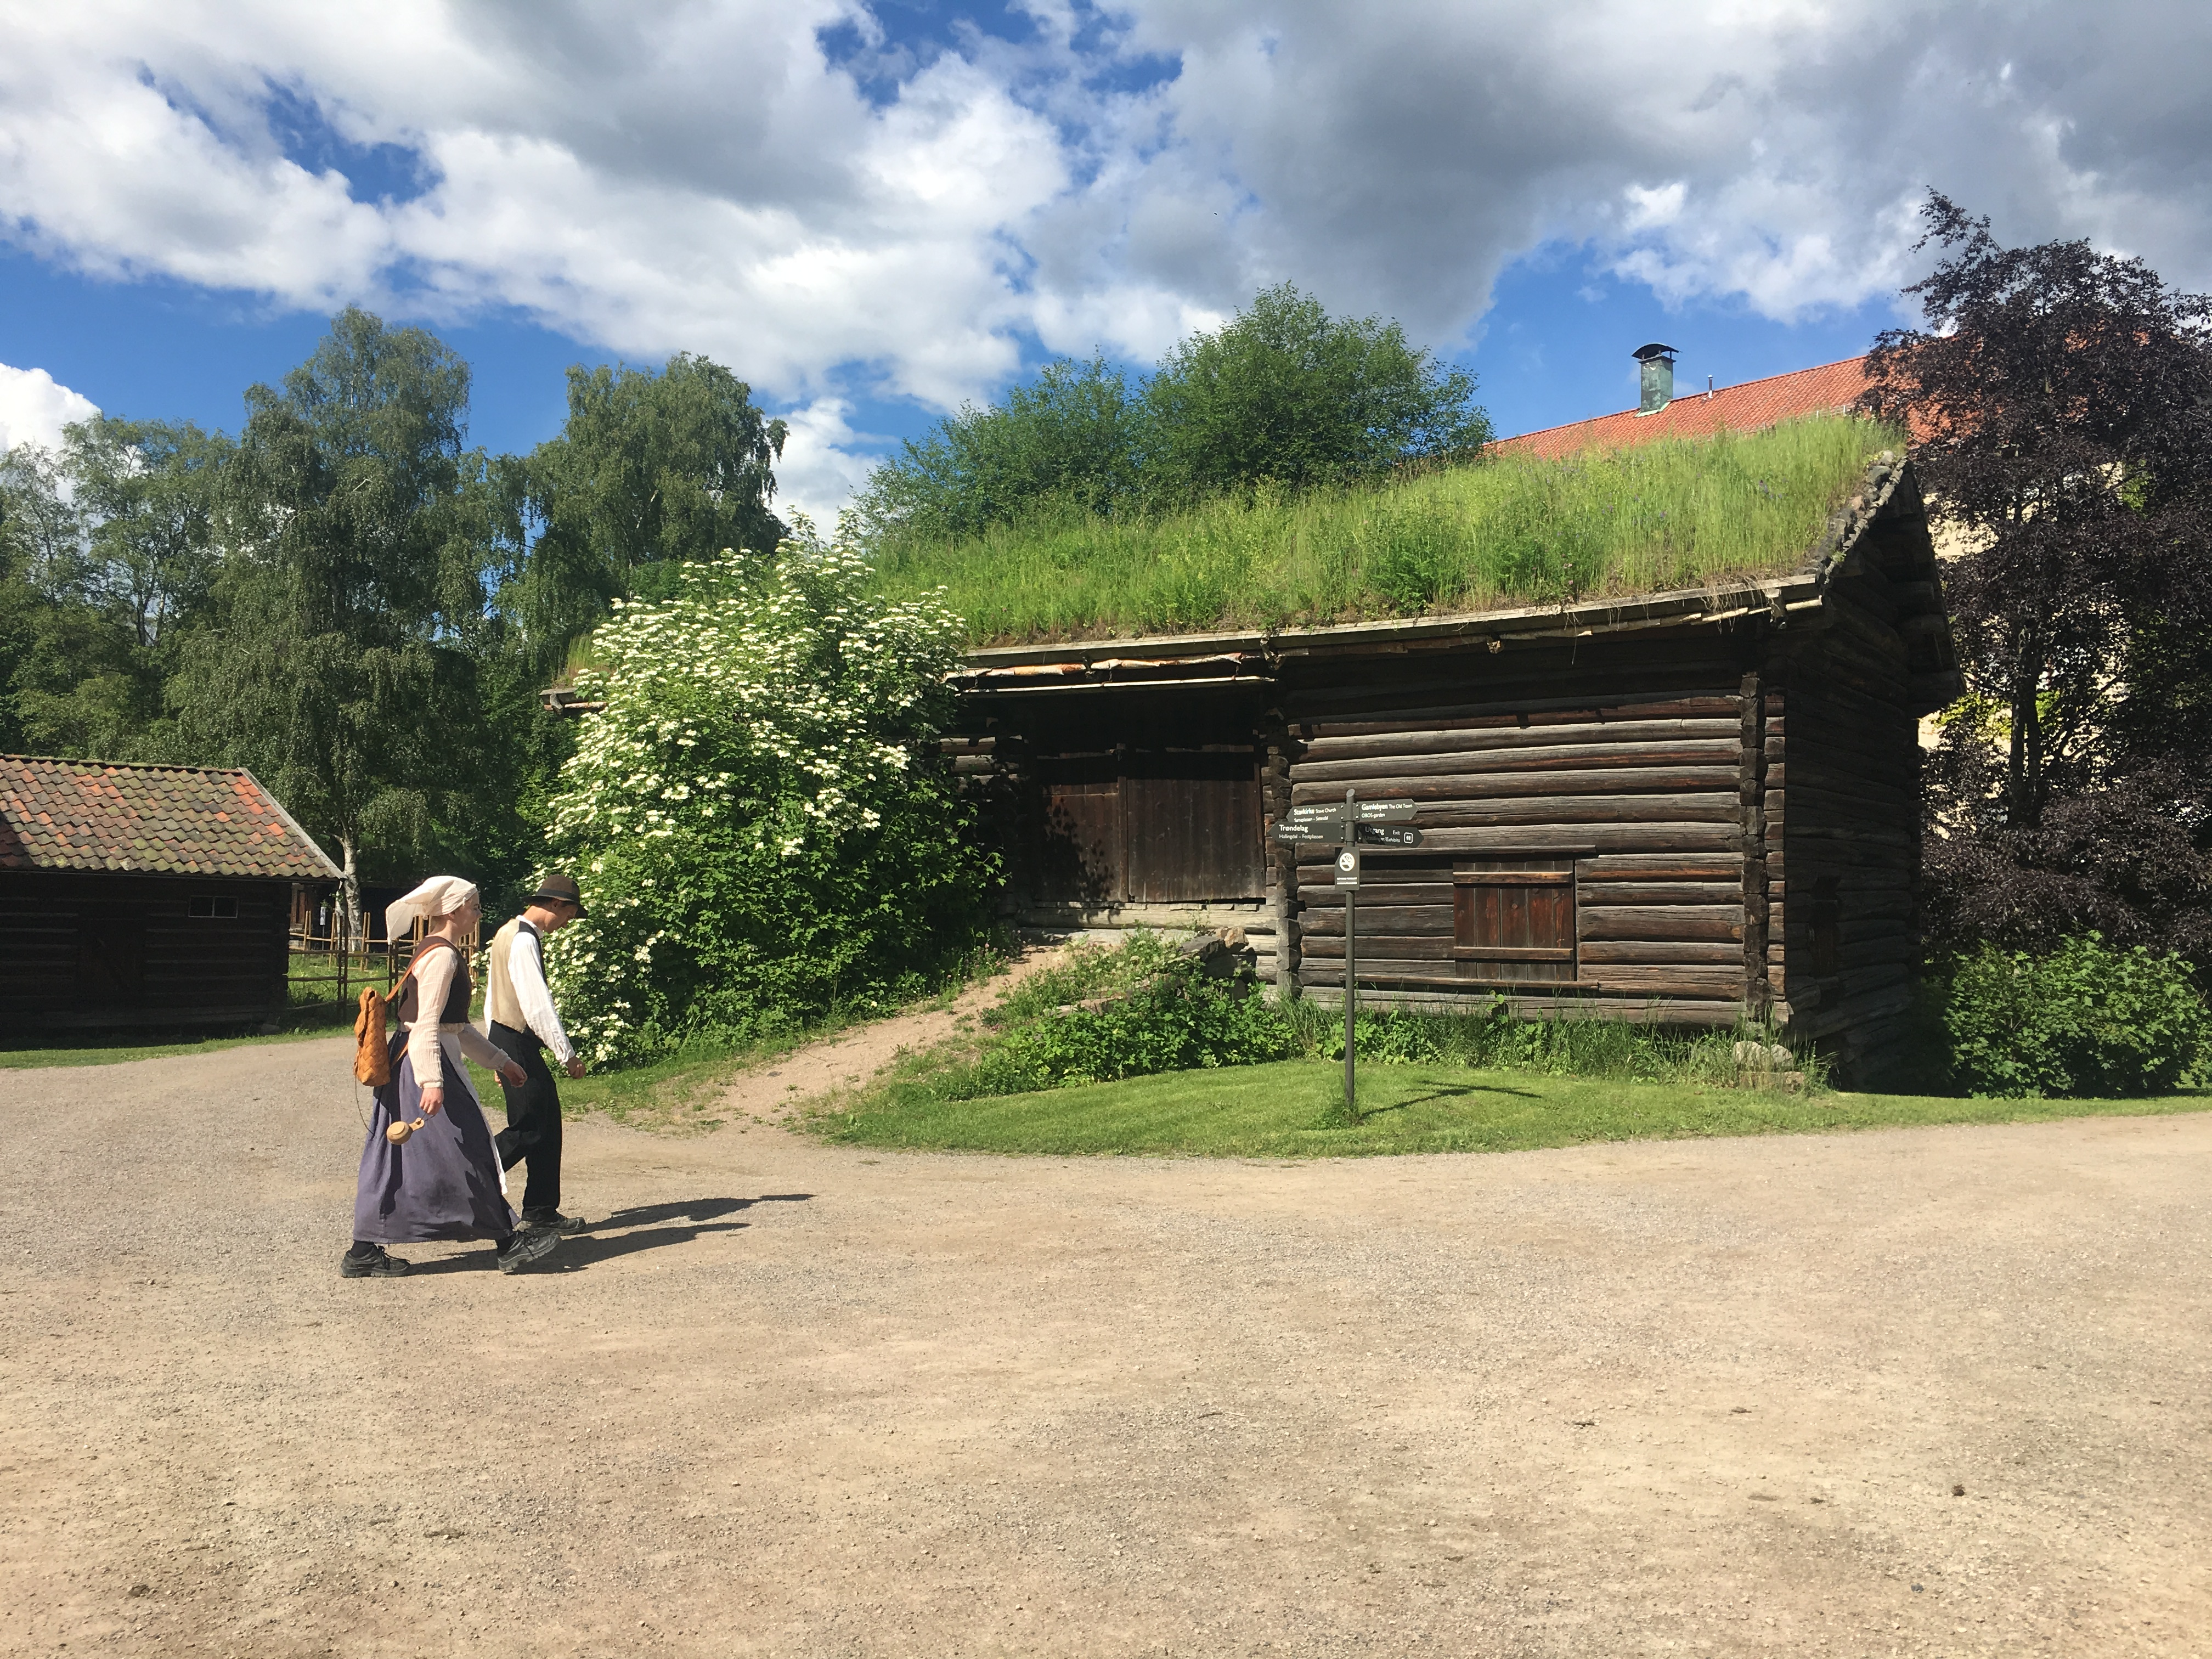 norwegian-folk-museum-norway-oslo